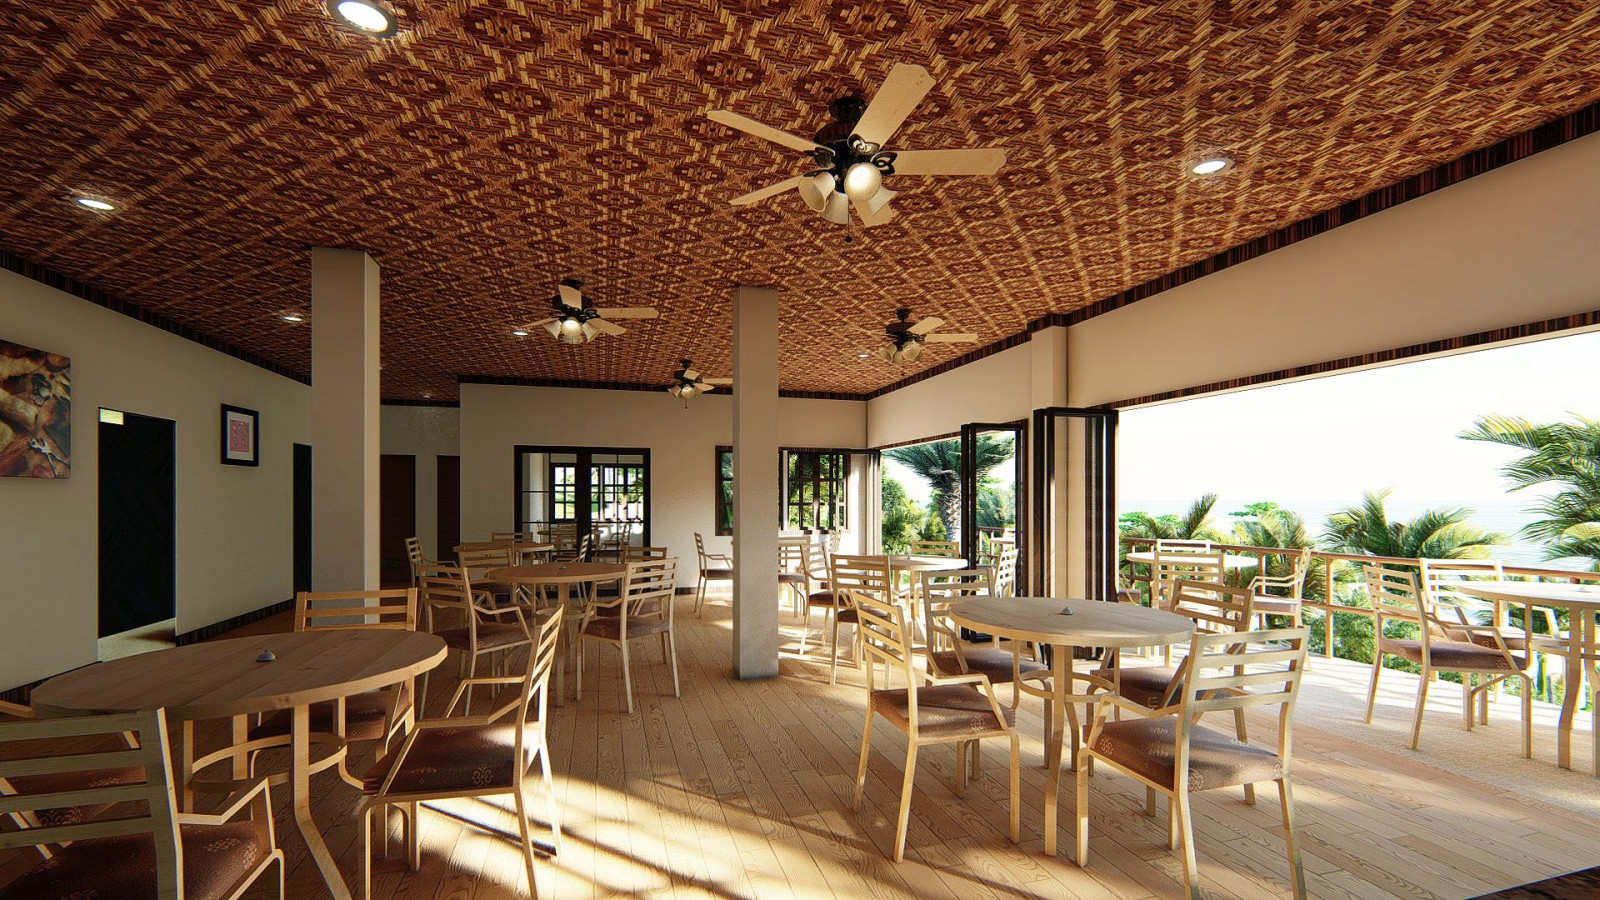 Restaurant Business Opportunity in Siquijor